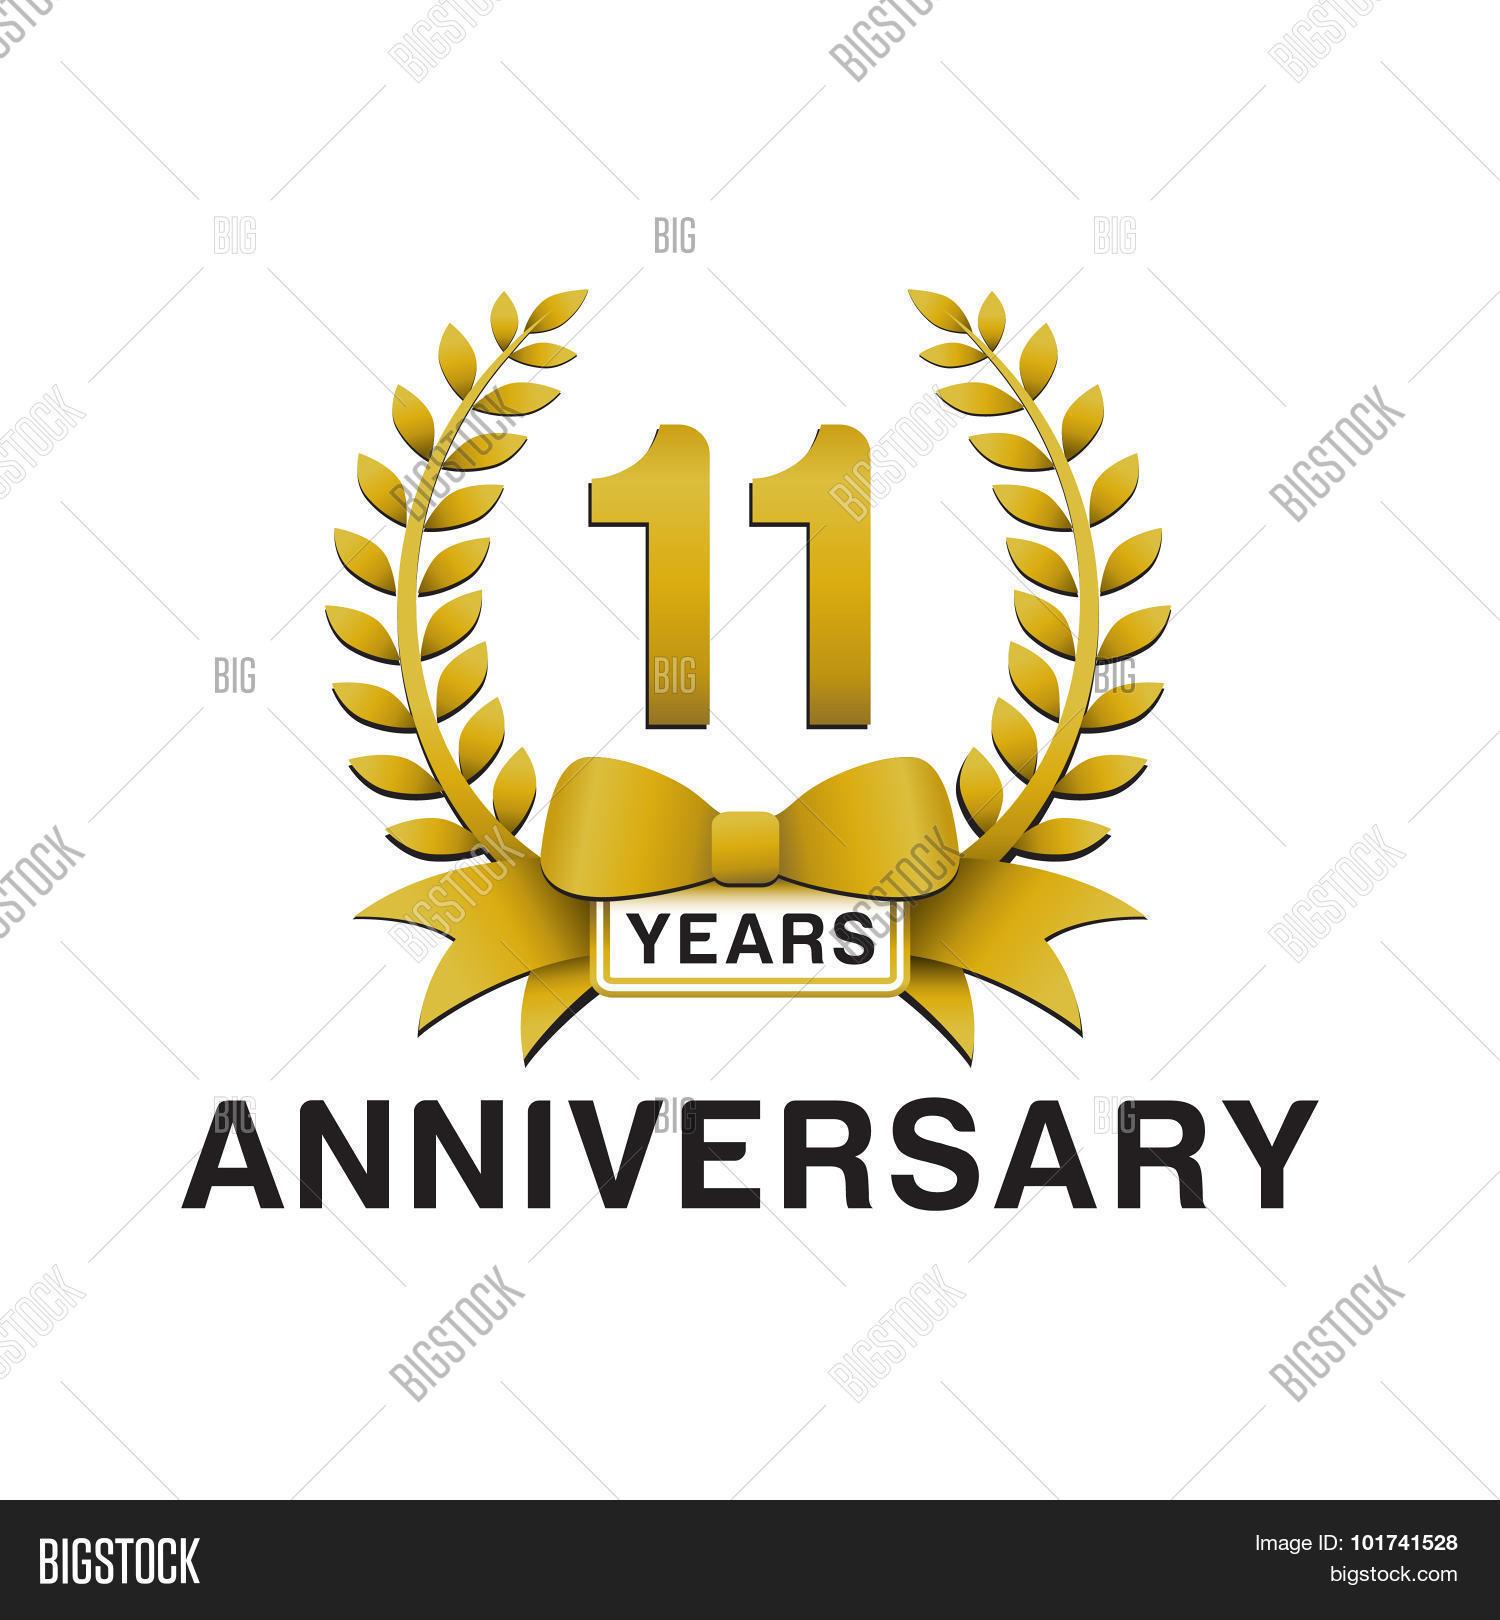 11th anniversary vector photo free trial bigstock